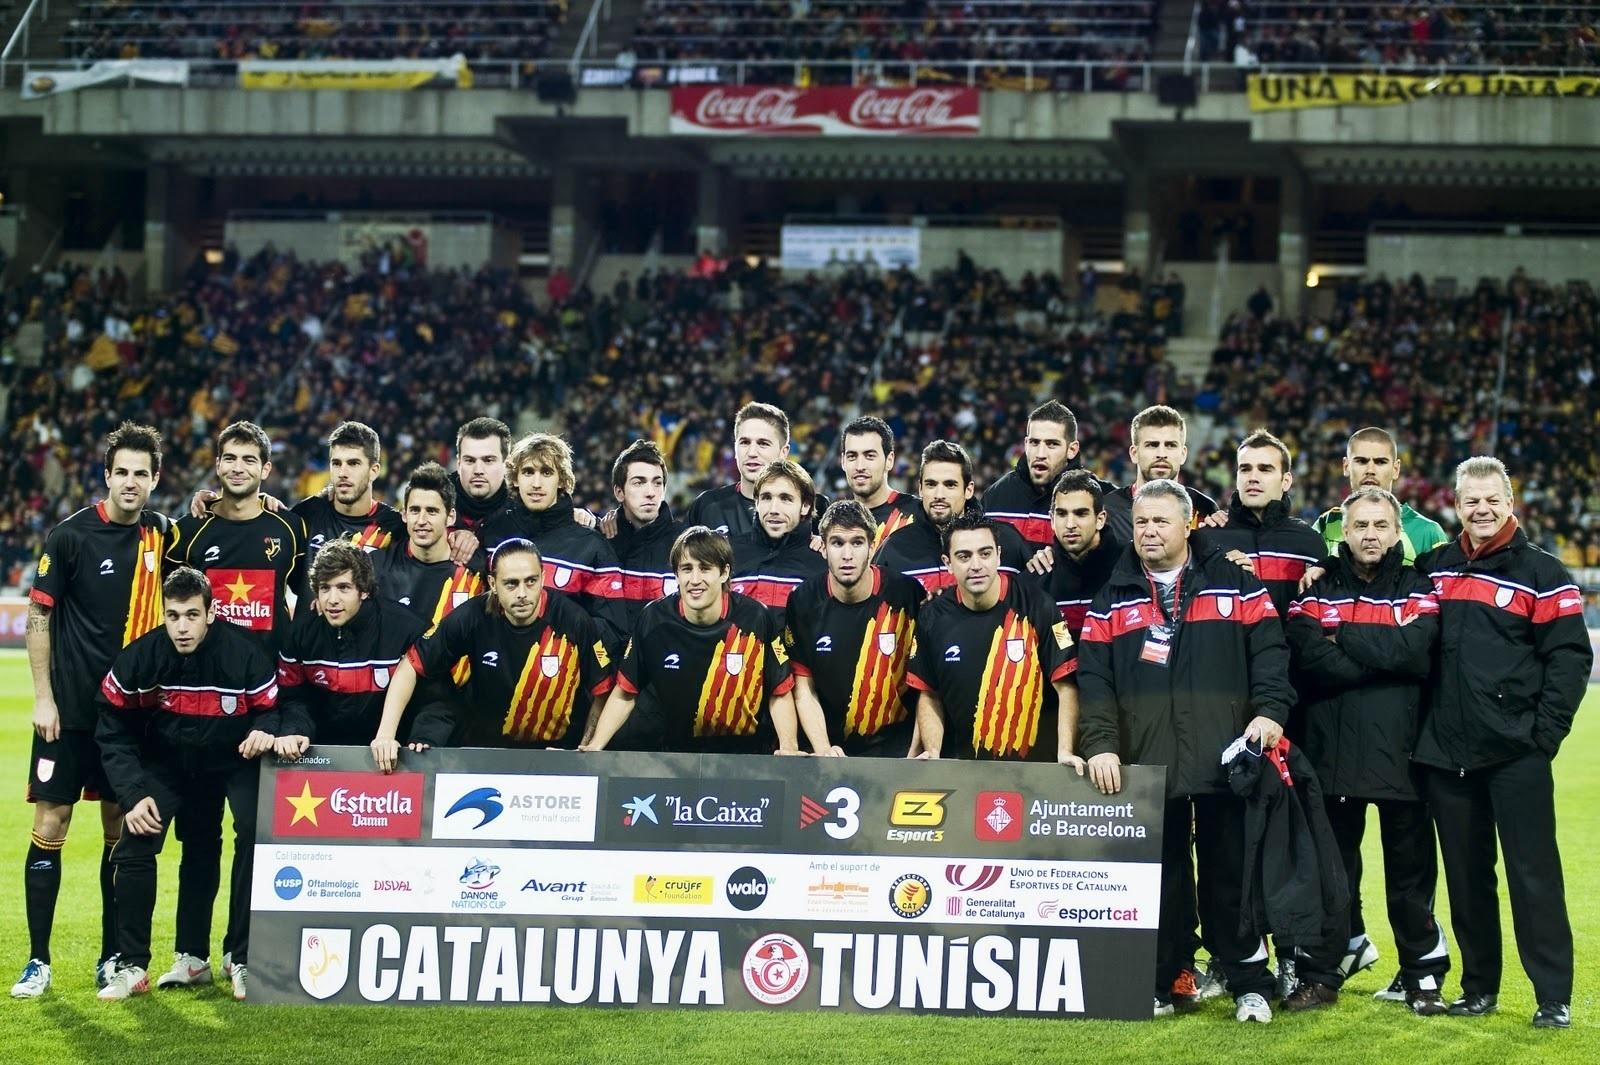 Catalunya-2011-Astore-home-kit-black-blck-black-line-up.jpg